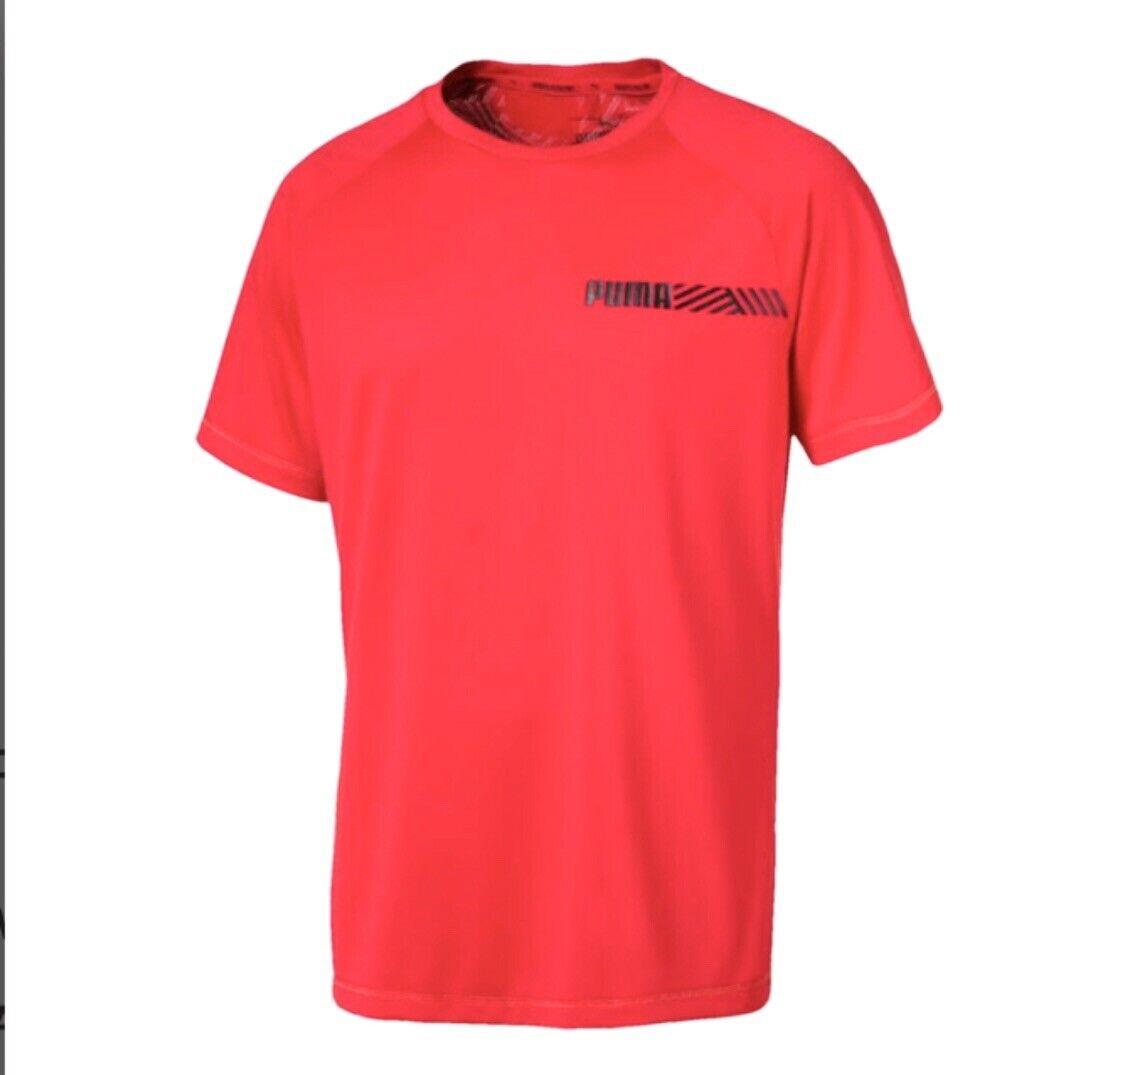 Puma Moisture Management Mens's T Shirt Size  MEDIUM